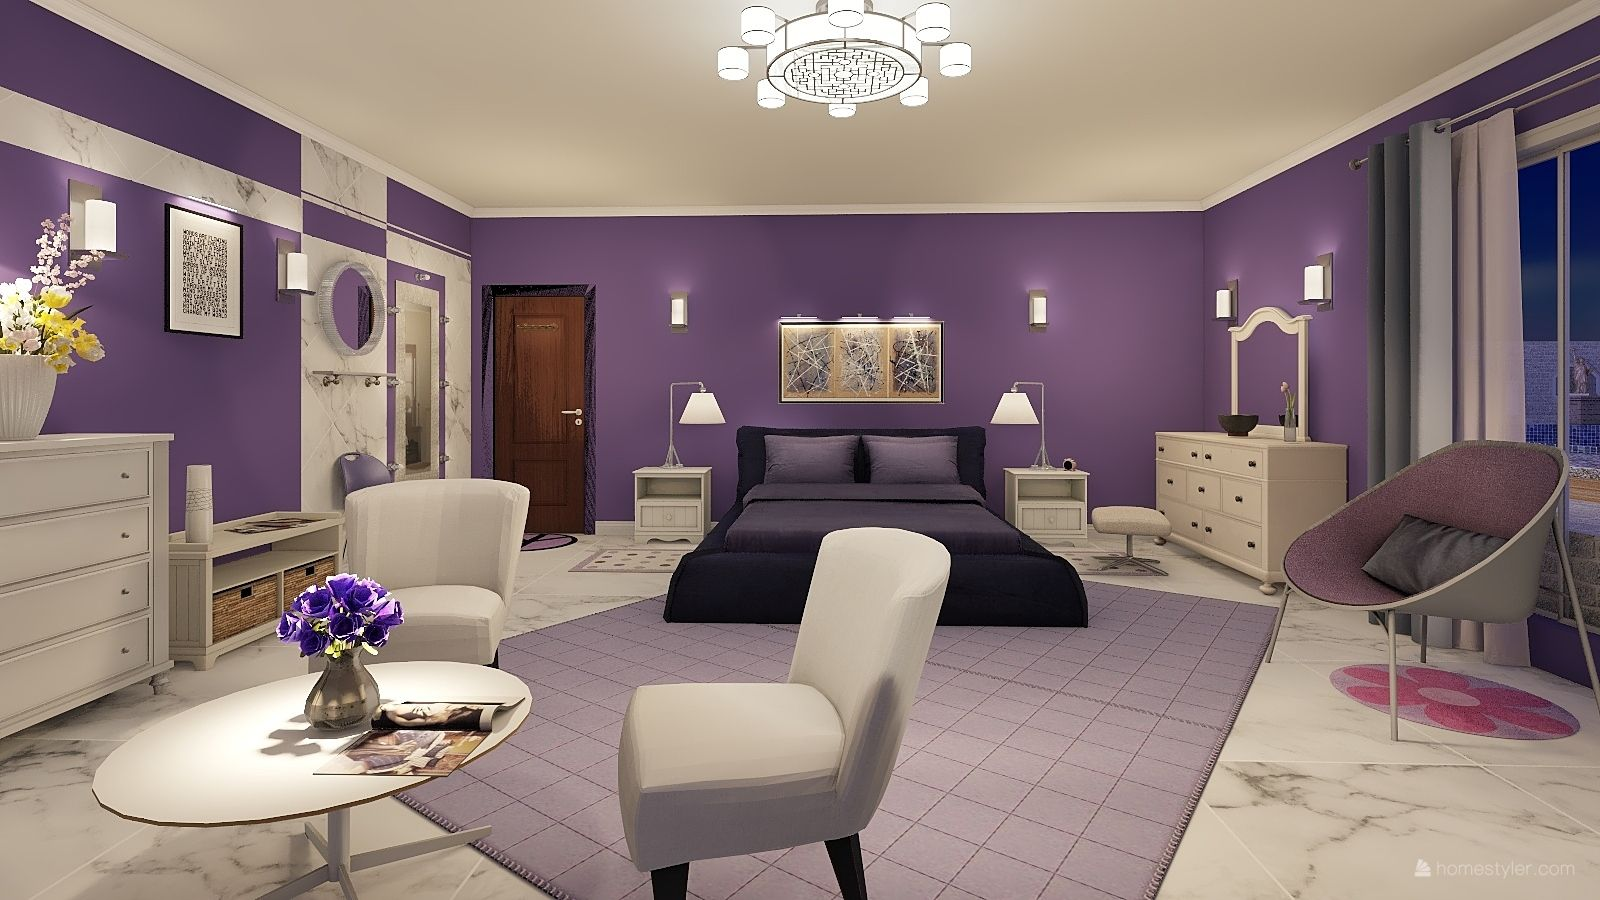 Bedroom Design By Alain Groetzinger Bedroom Design Room Design Software Home Design Software 3d Home Design Software Bedroom design online 3d